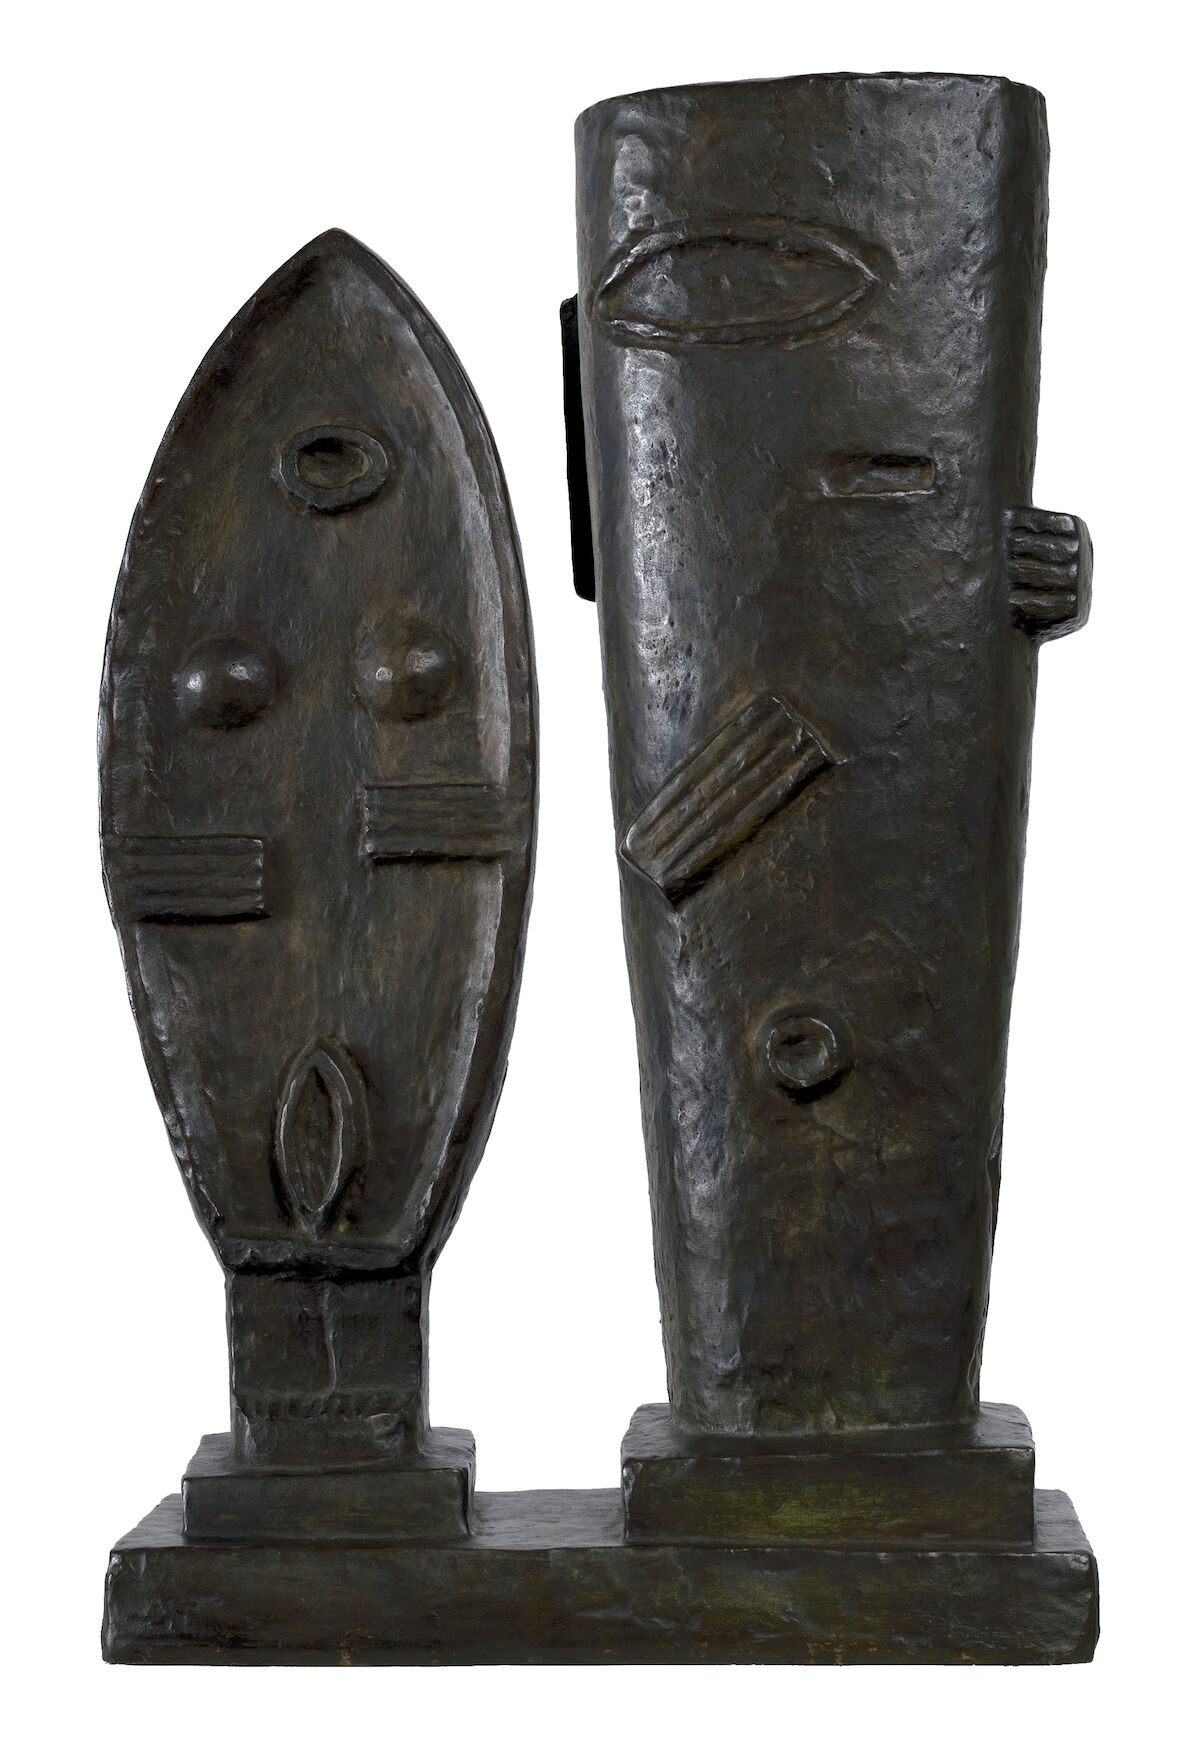 Alberto Giacometti, Le Couple, 1927. Est. $900,000 to $1.5 million. Courtesy Sotheby's.